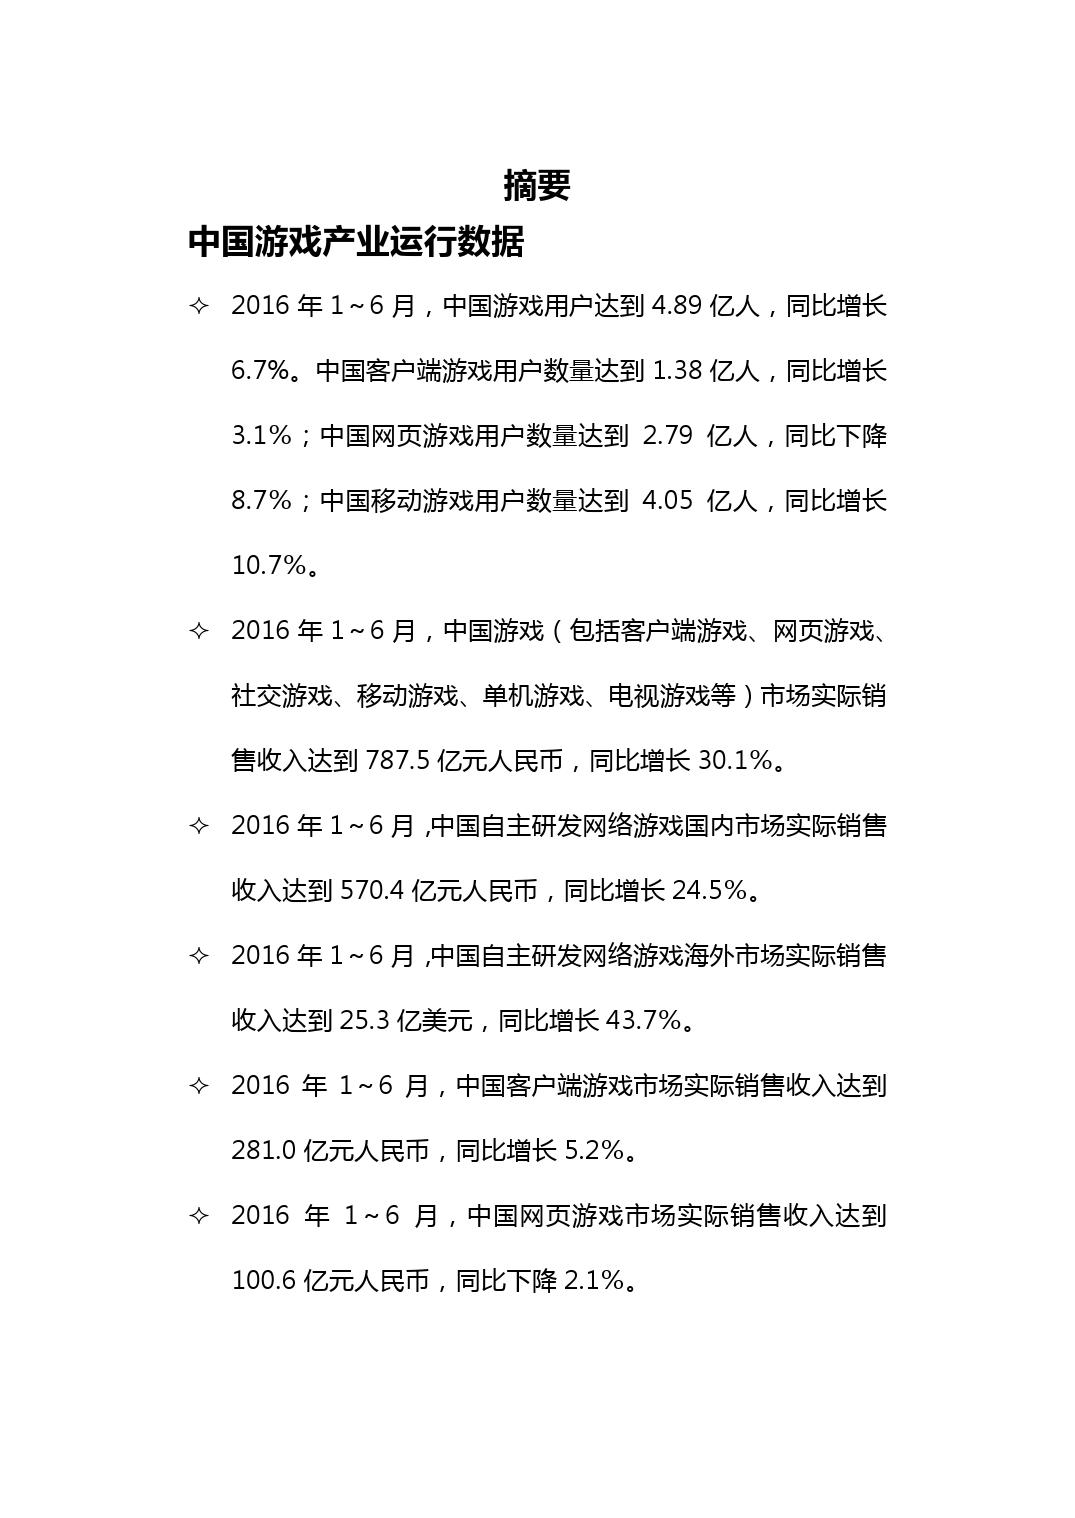 2016%e5%b9%b41-6%e6%9c%88%e4%b8%ad%e5%9b%bd%e4%ba%a7%e4%b8%9a%e6%b8%b8%e6%88%8f%e6%8a%a5%e5%91%8a_000009